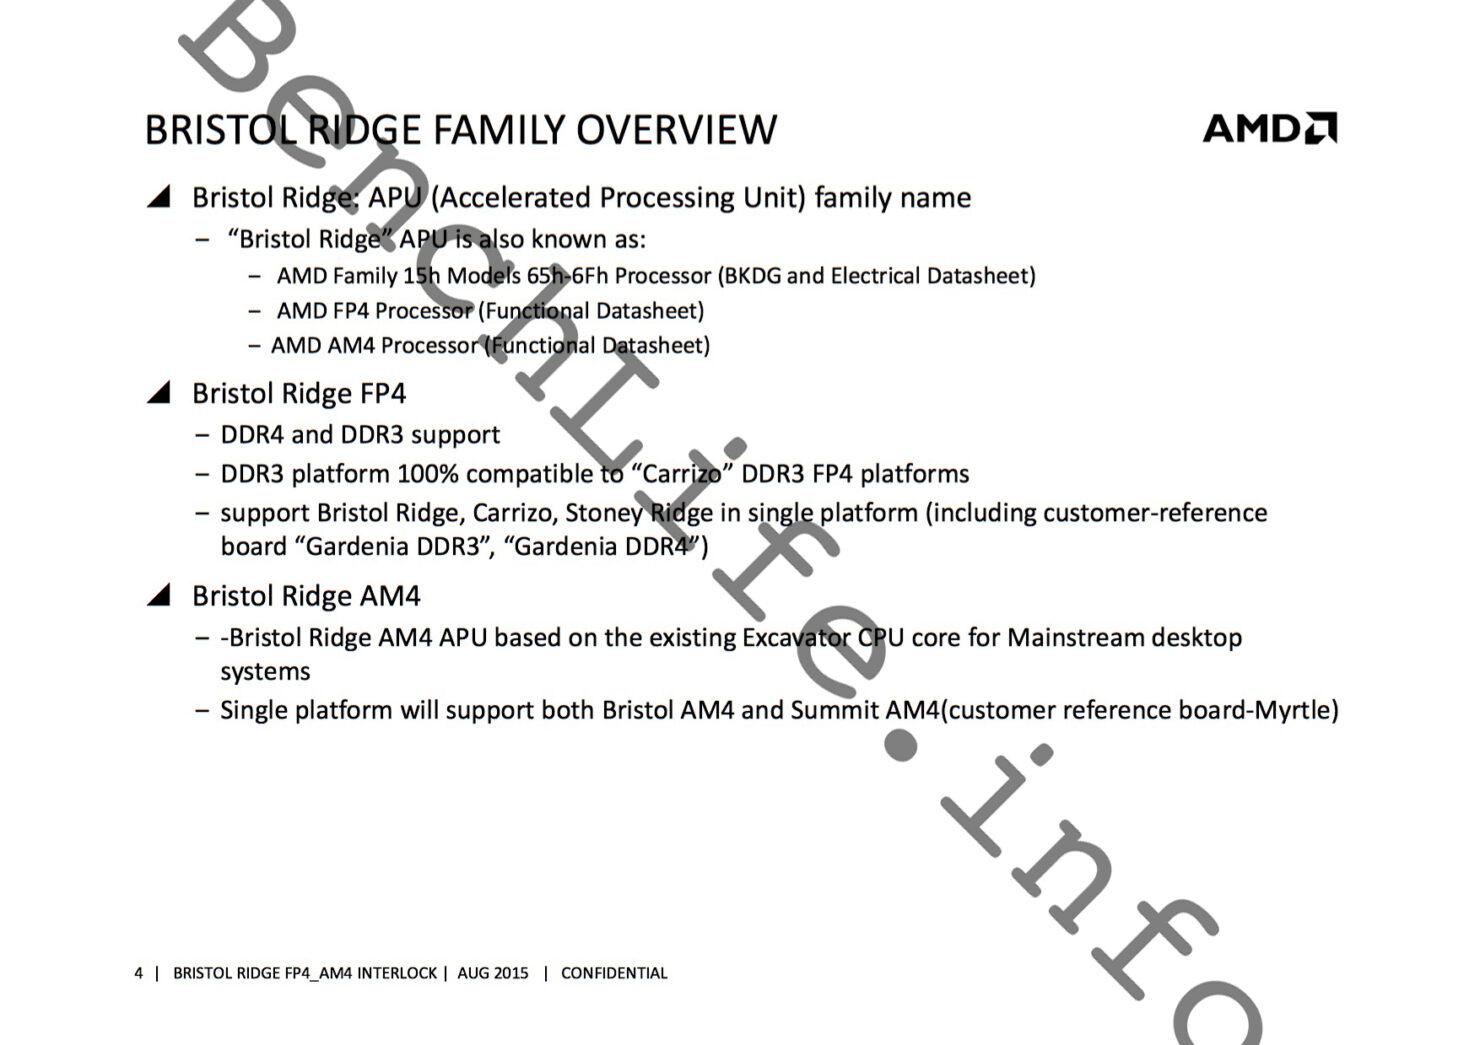 amd-bristol-ridge-apu-family_overview